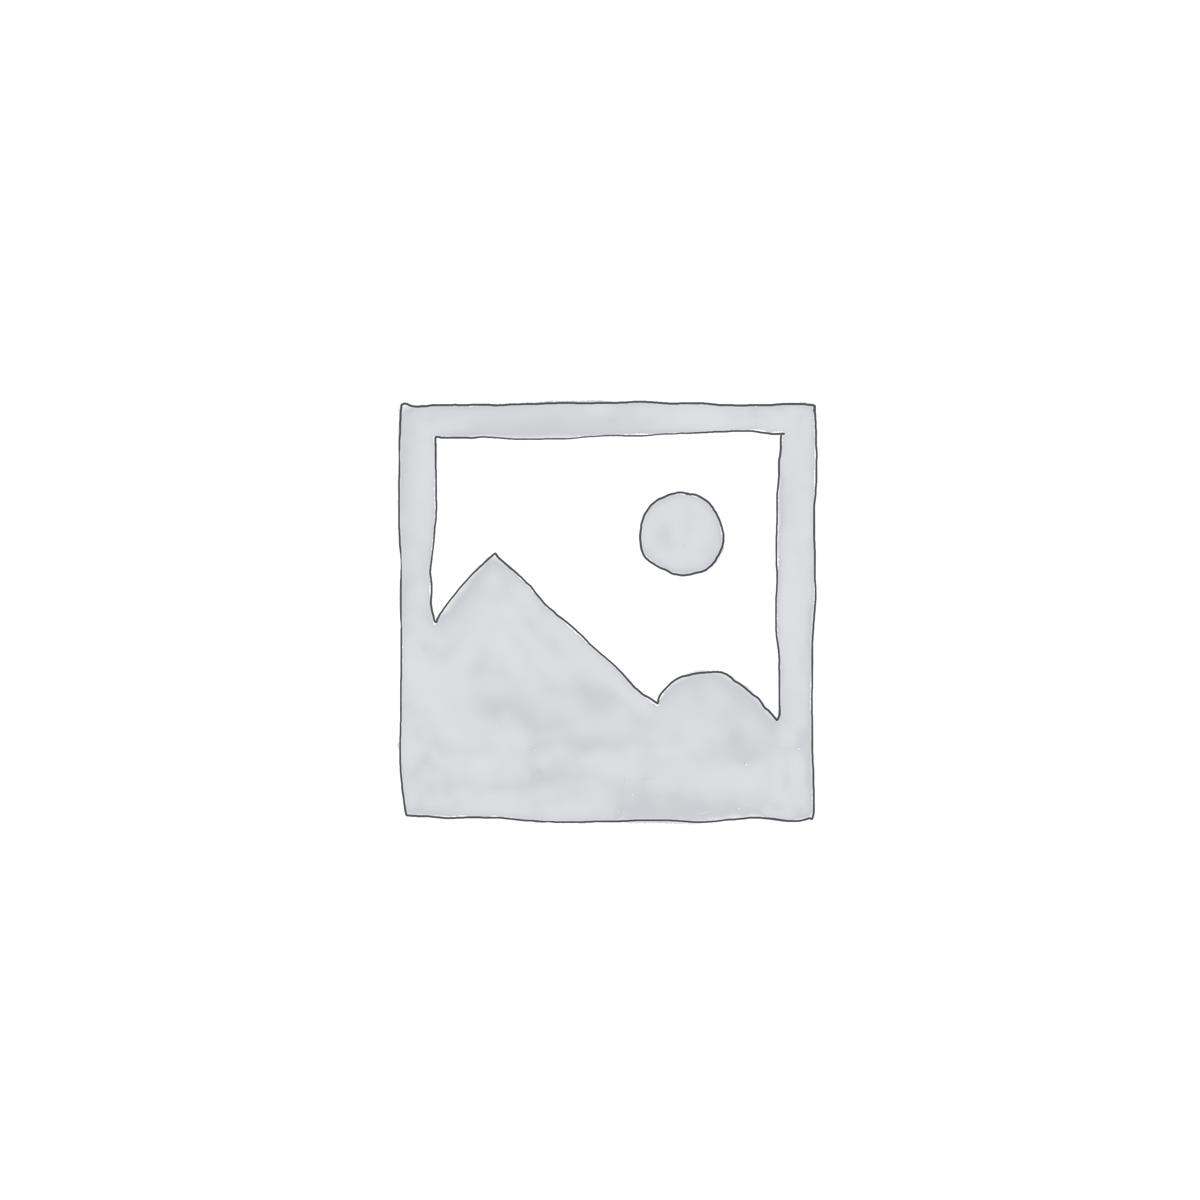 Bordure e lamine in acciaio Cor-Ten